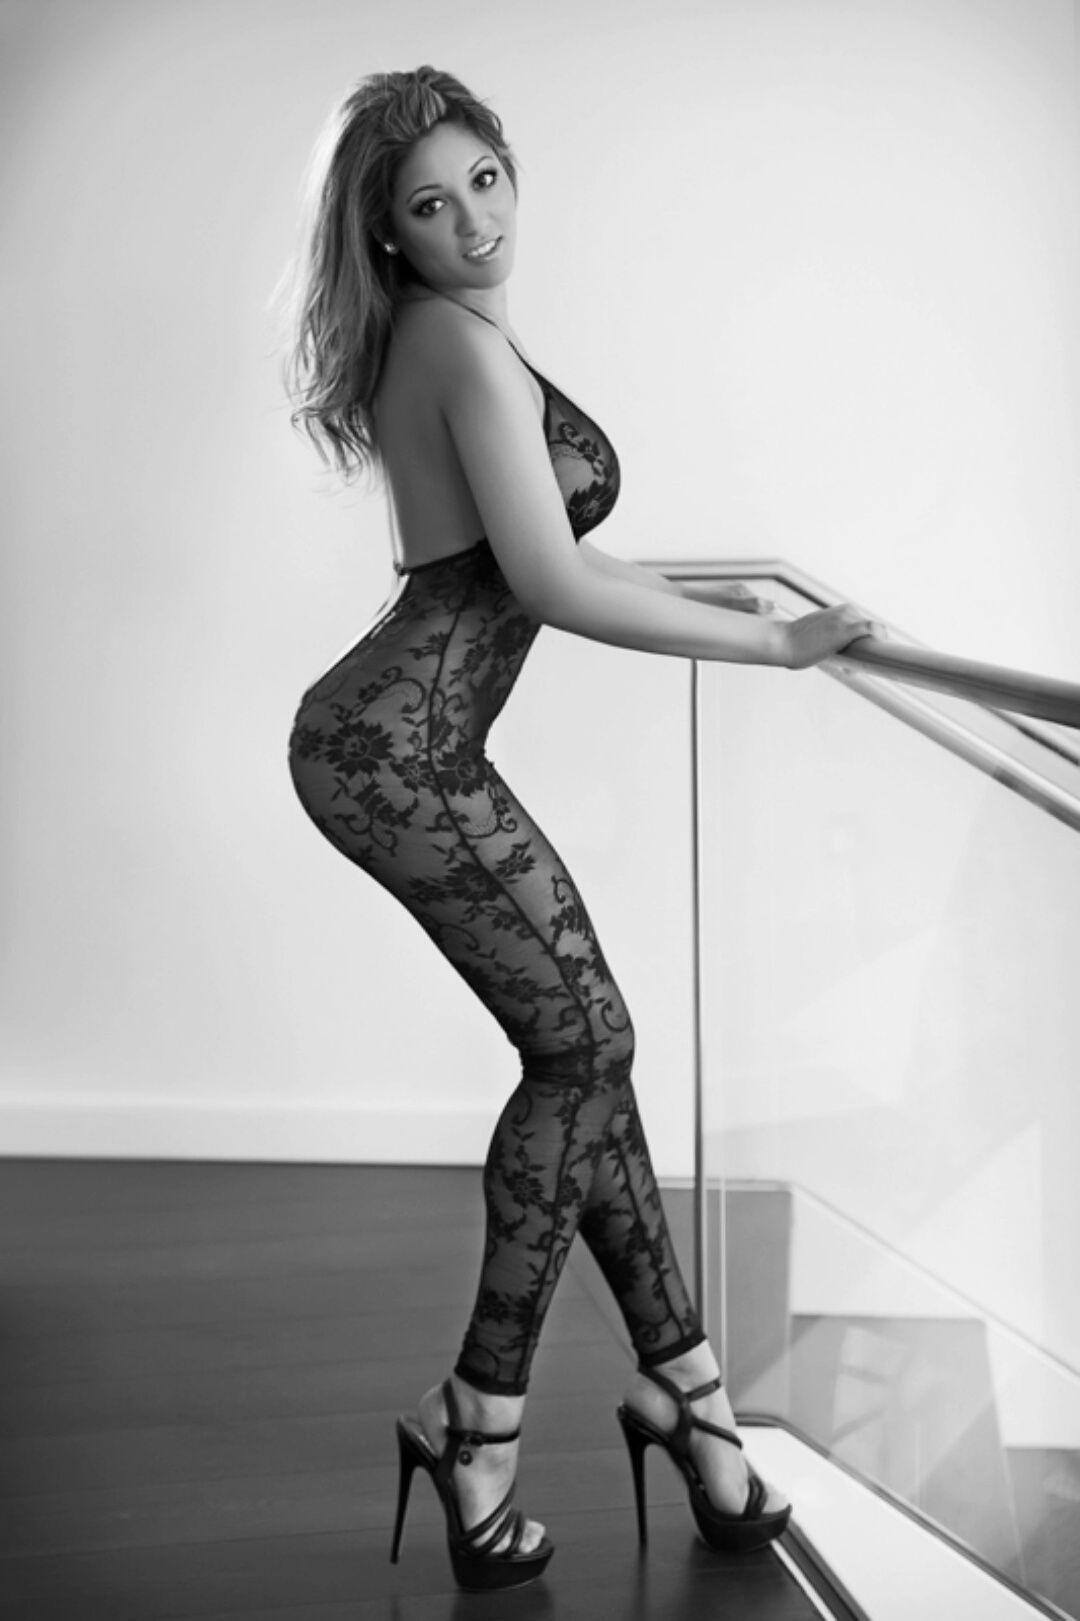 tumblr beautiful female bodies